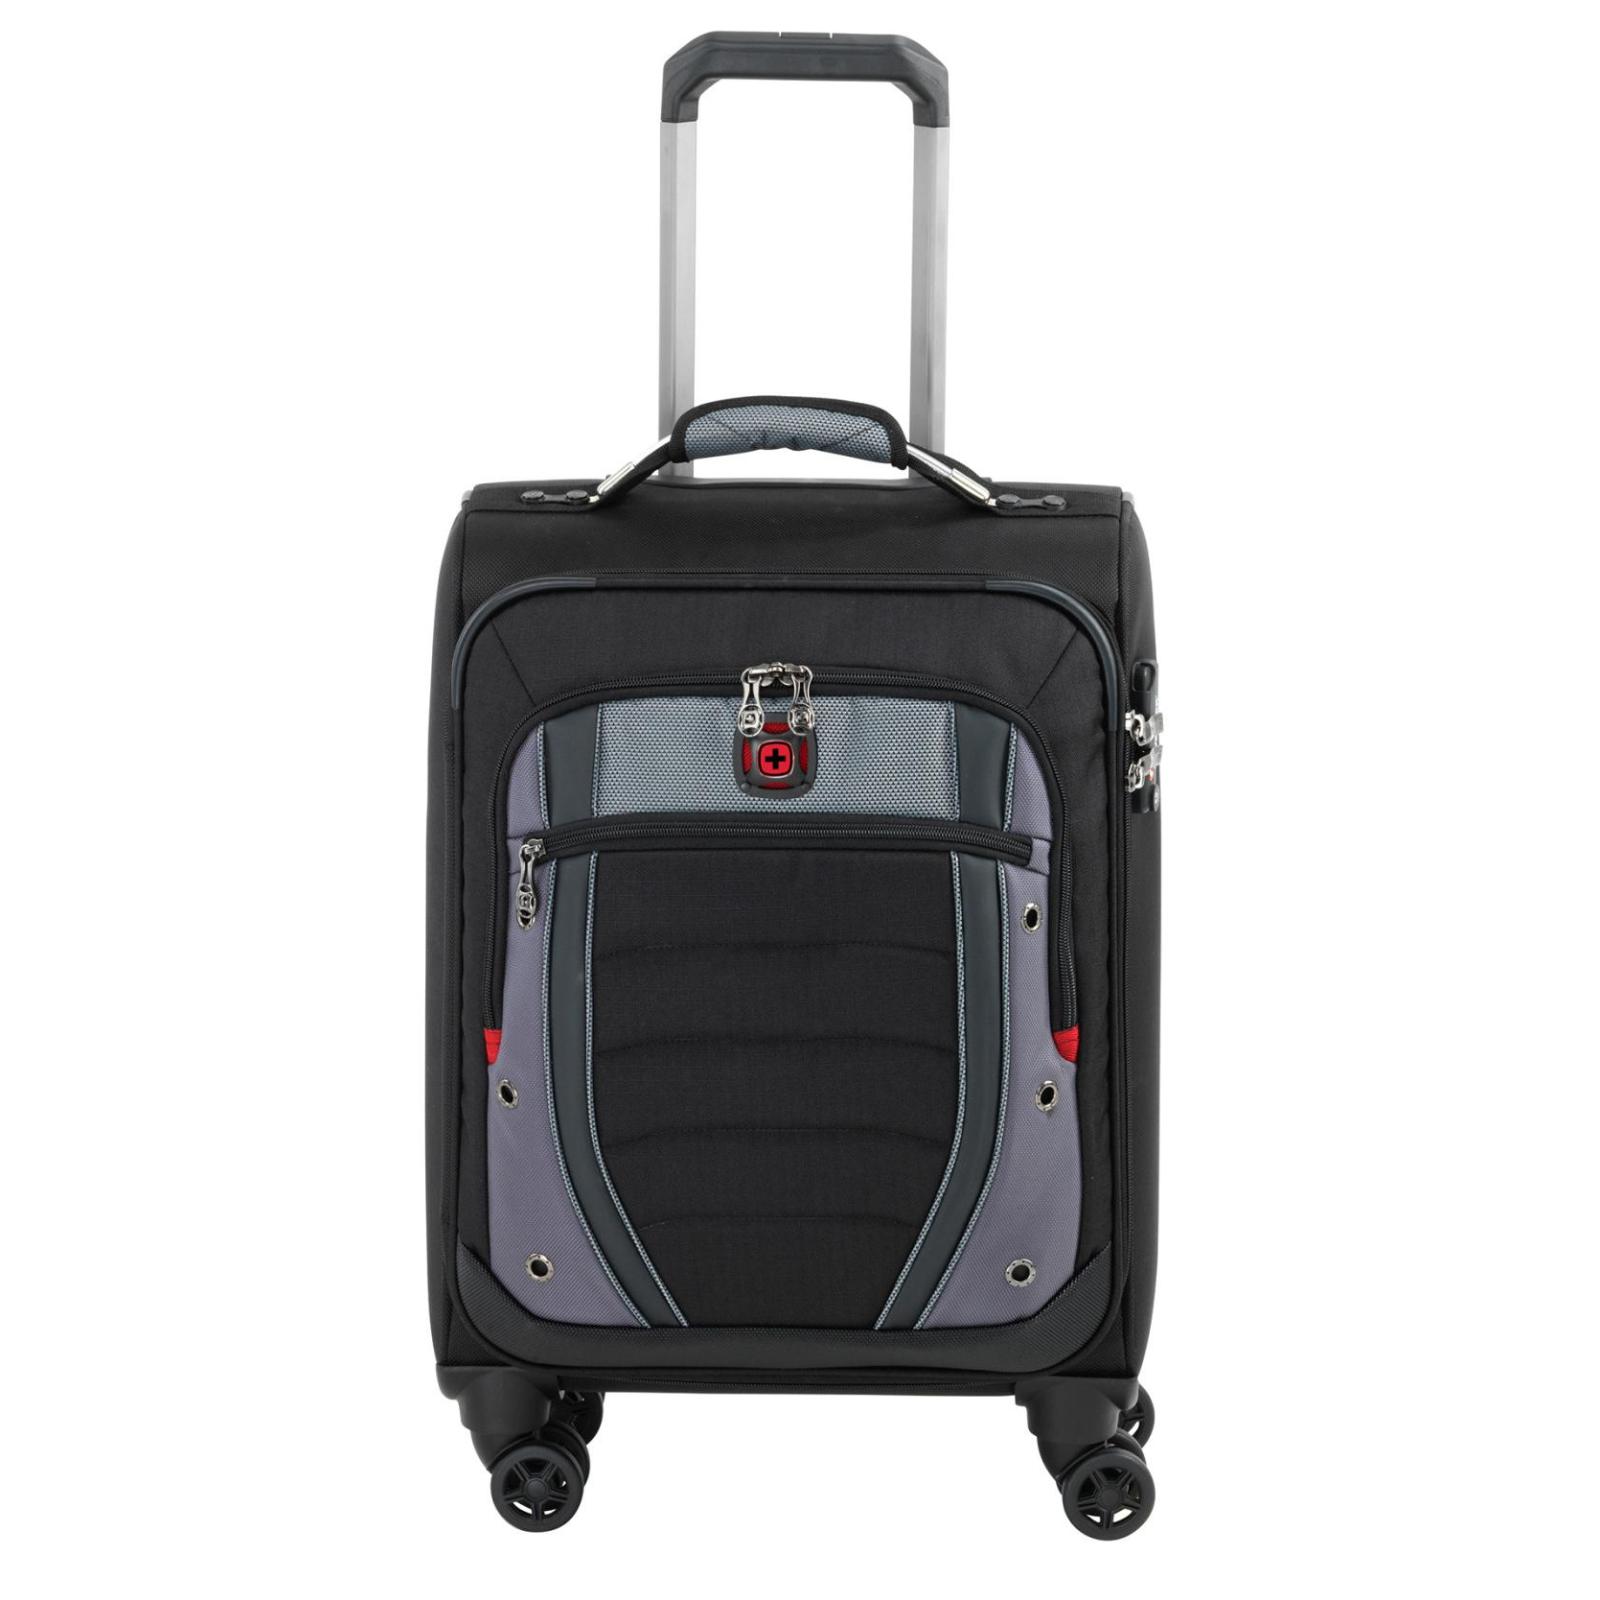 Чемодан Wenger Synergy, малый, 4 колеса (чёрный) (604377)